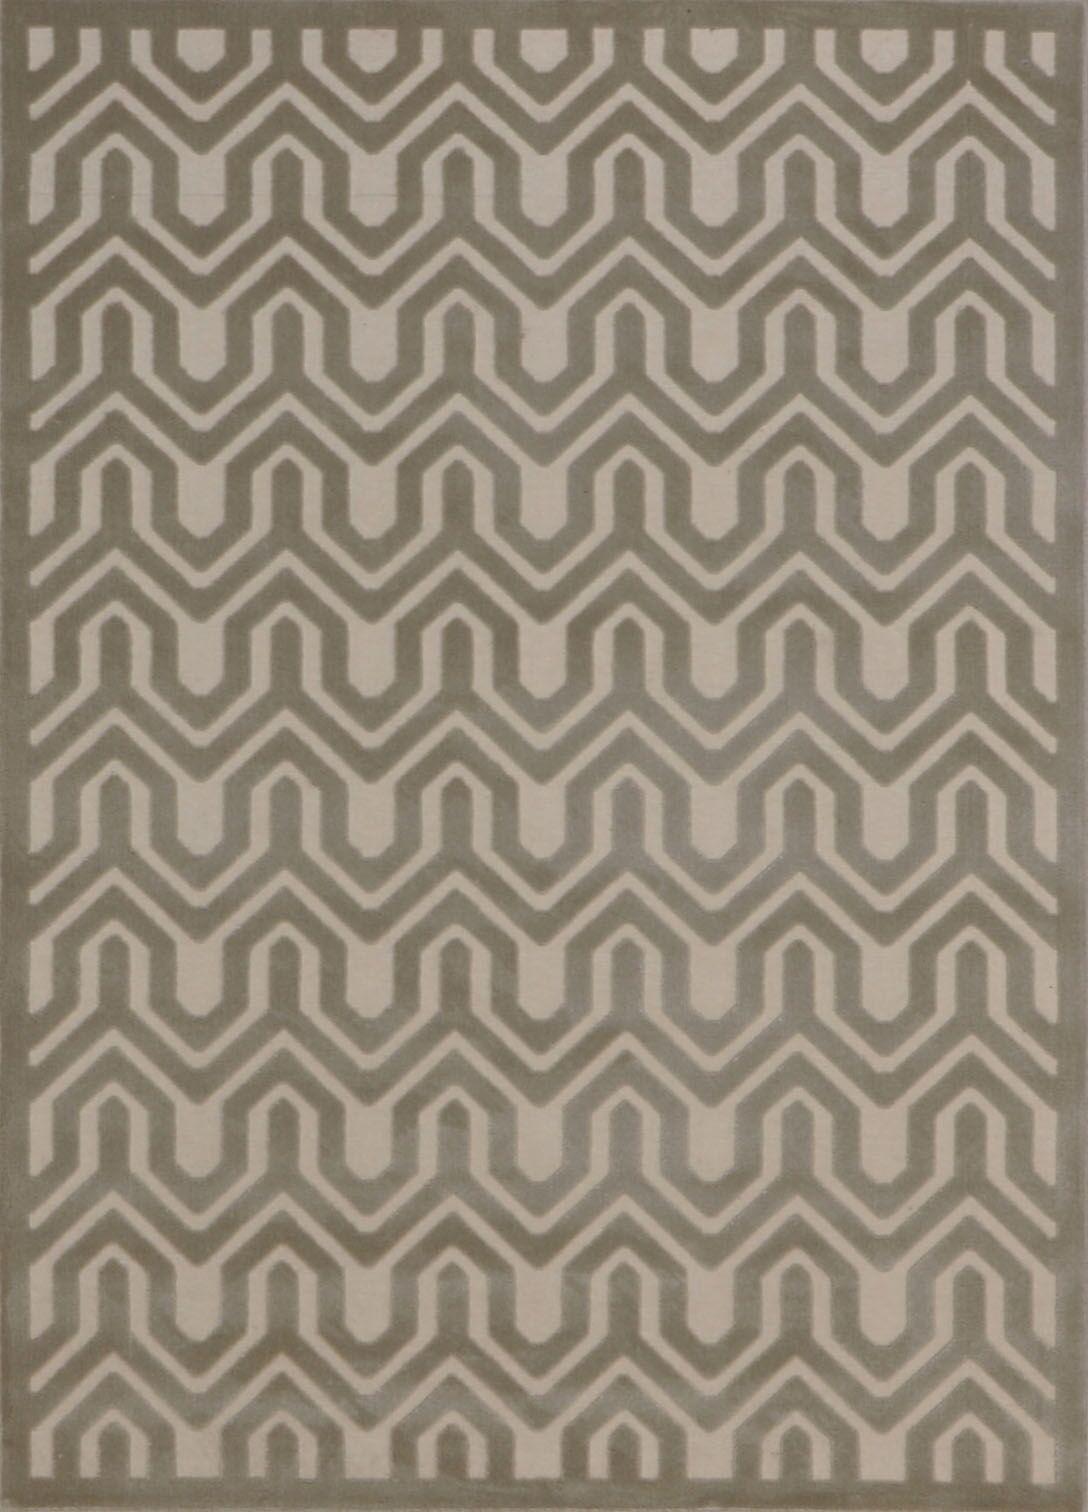 Zopyros Light Gray Area Rug Rug Size: Rectangle 5'3